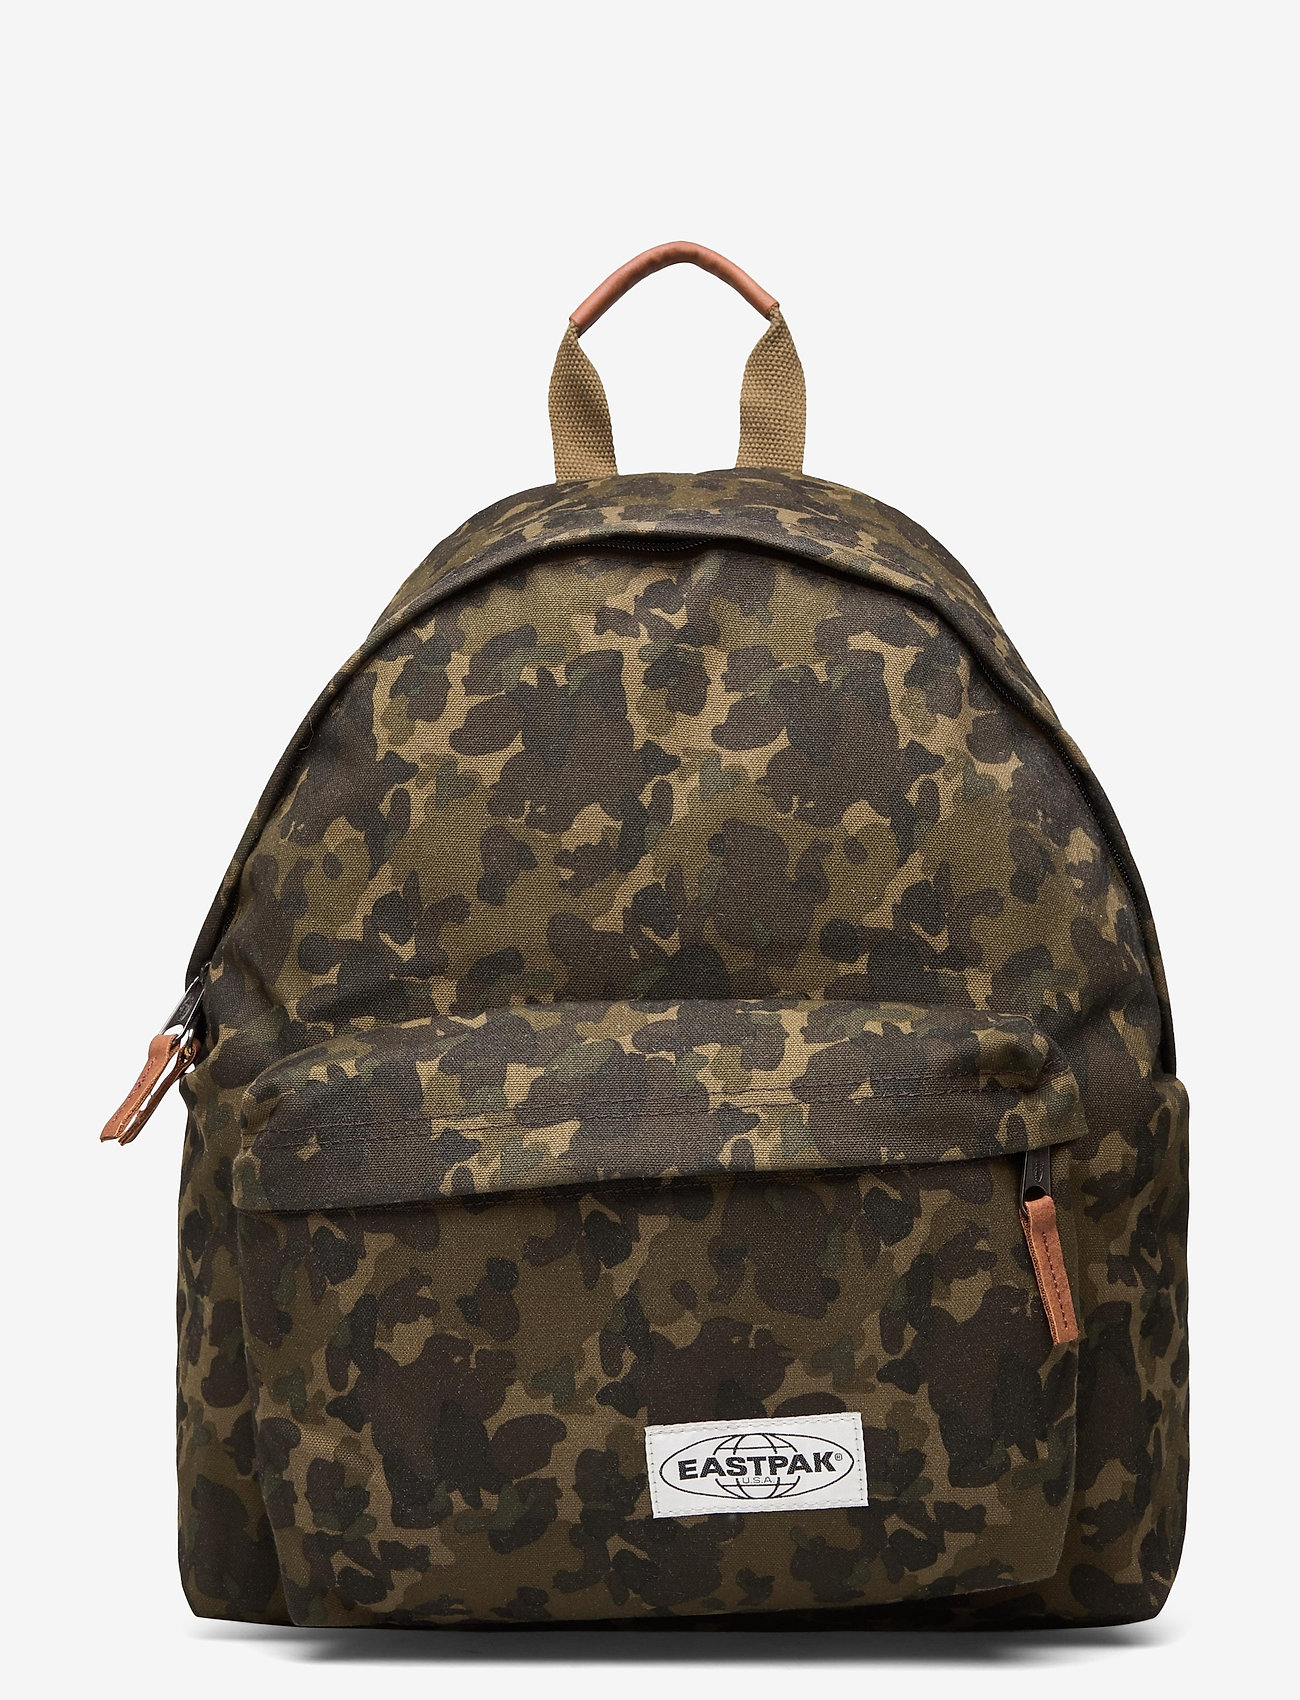 Eastpak - PADDED PAK'R - ryggsäckar - opgrade camo - 0